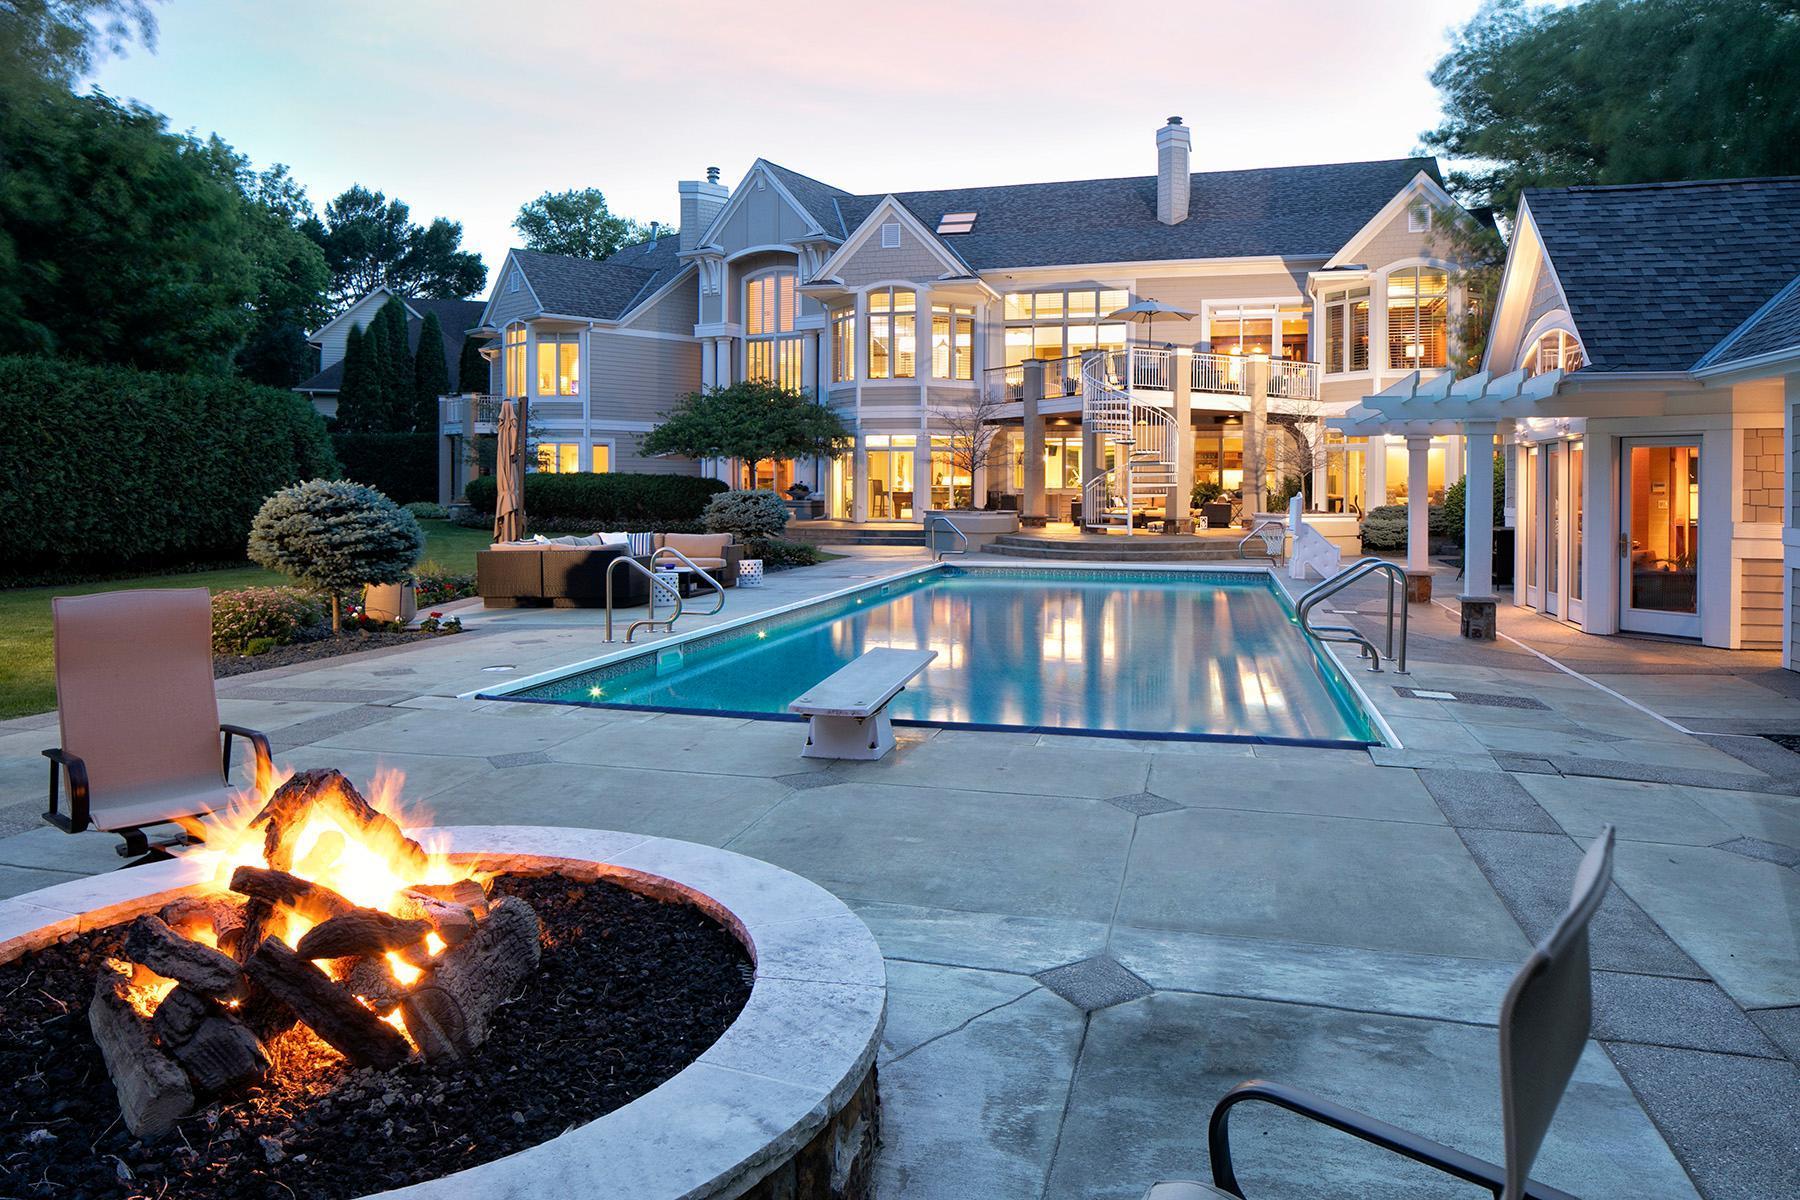 2350 Cherrywood Property Photo - Minnetonka, MN real estate listing